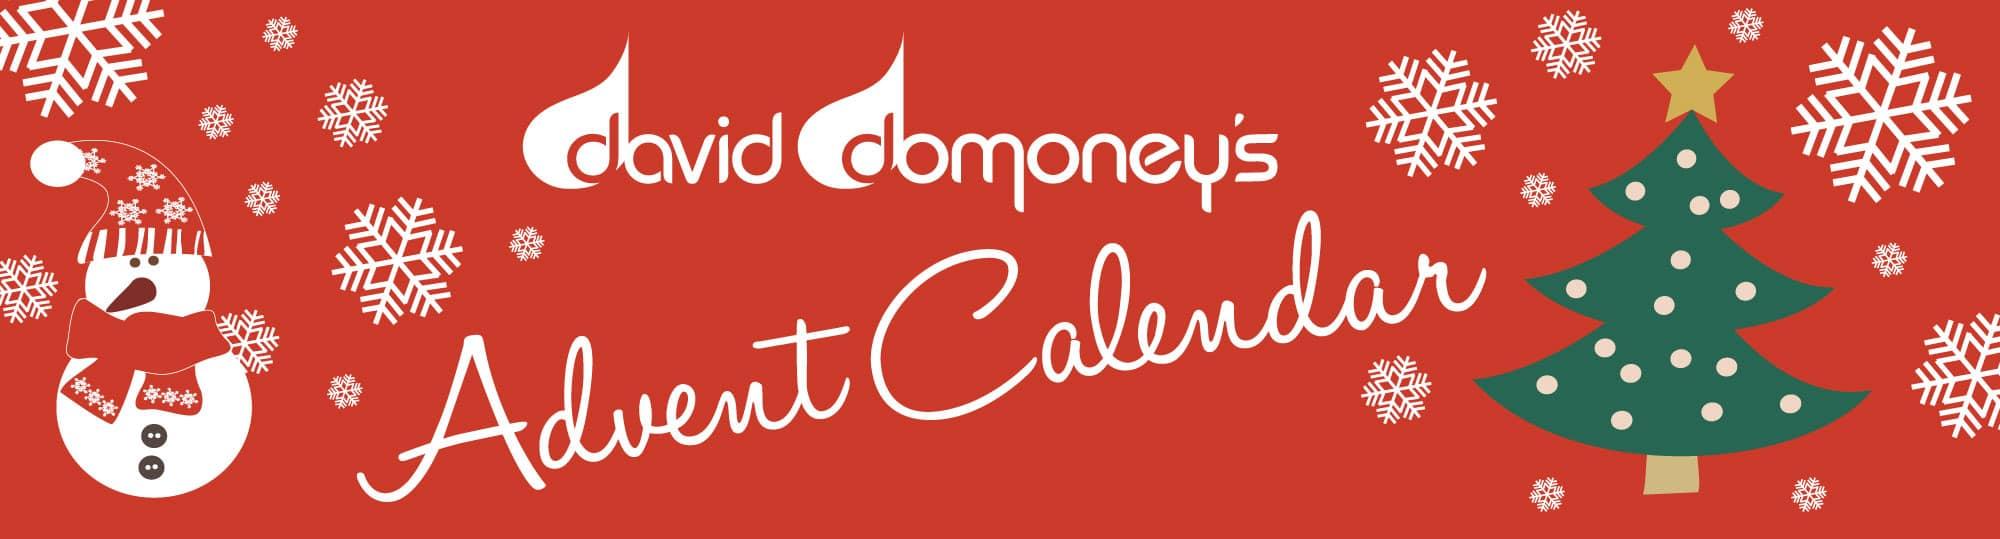 David Domoney's Christmas Advent Calendar